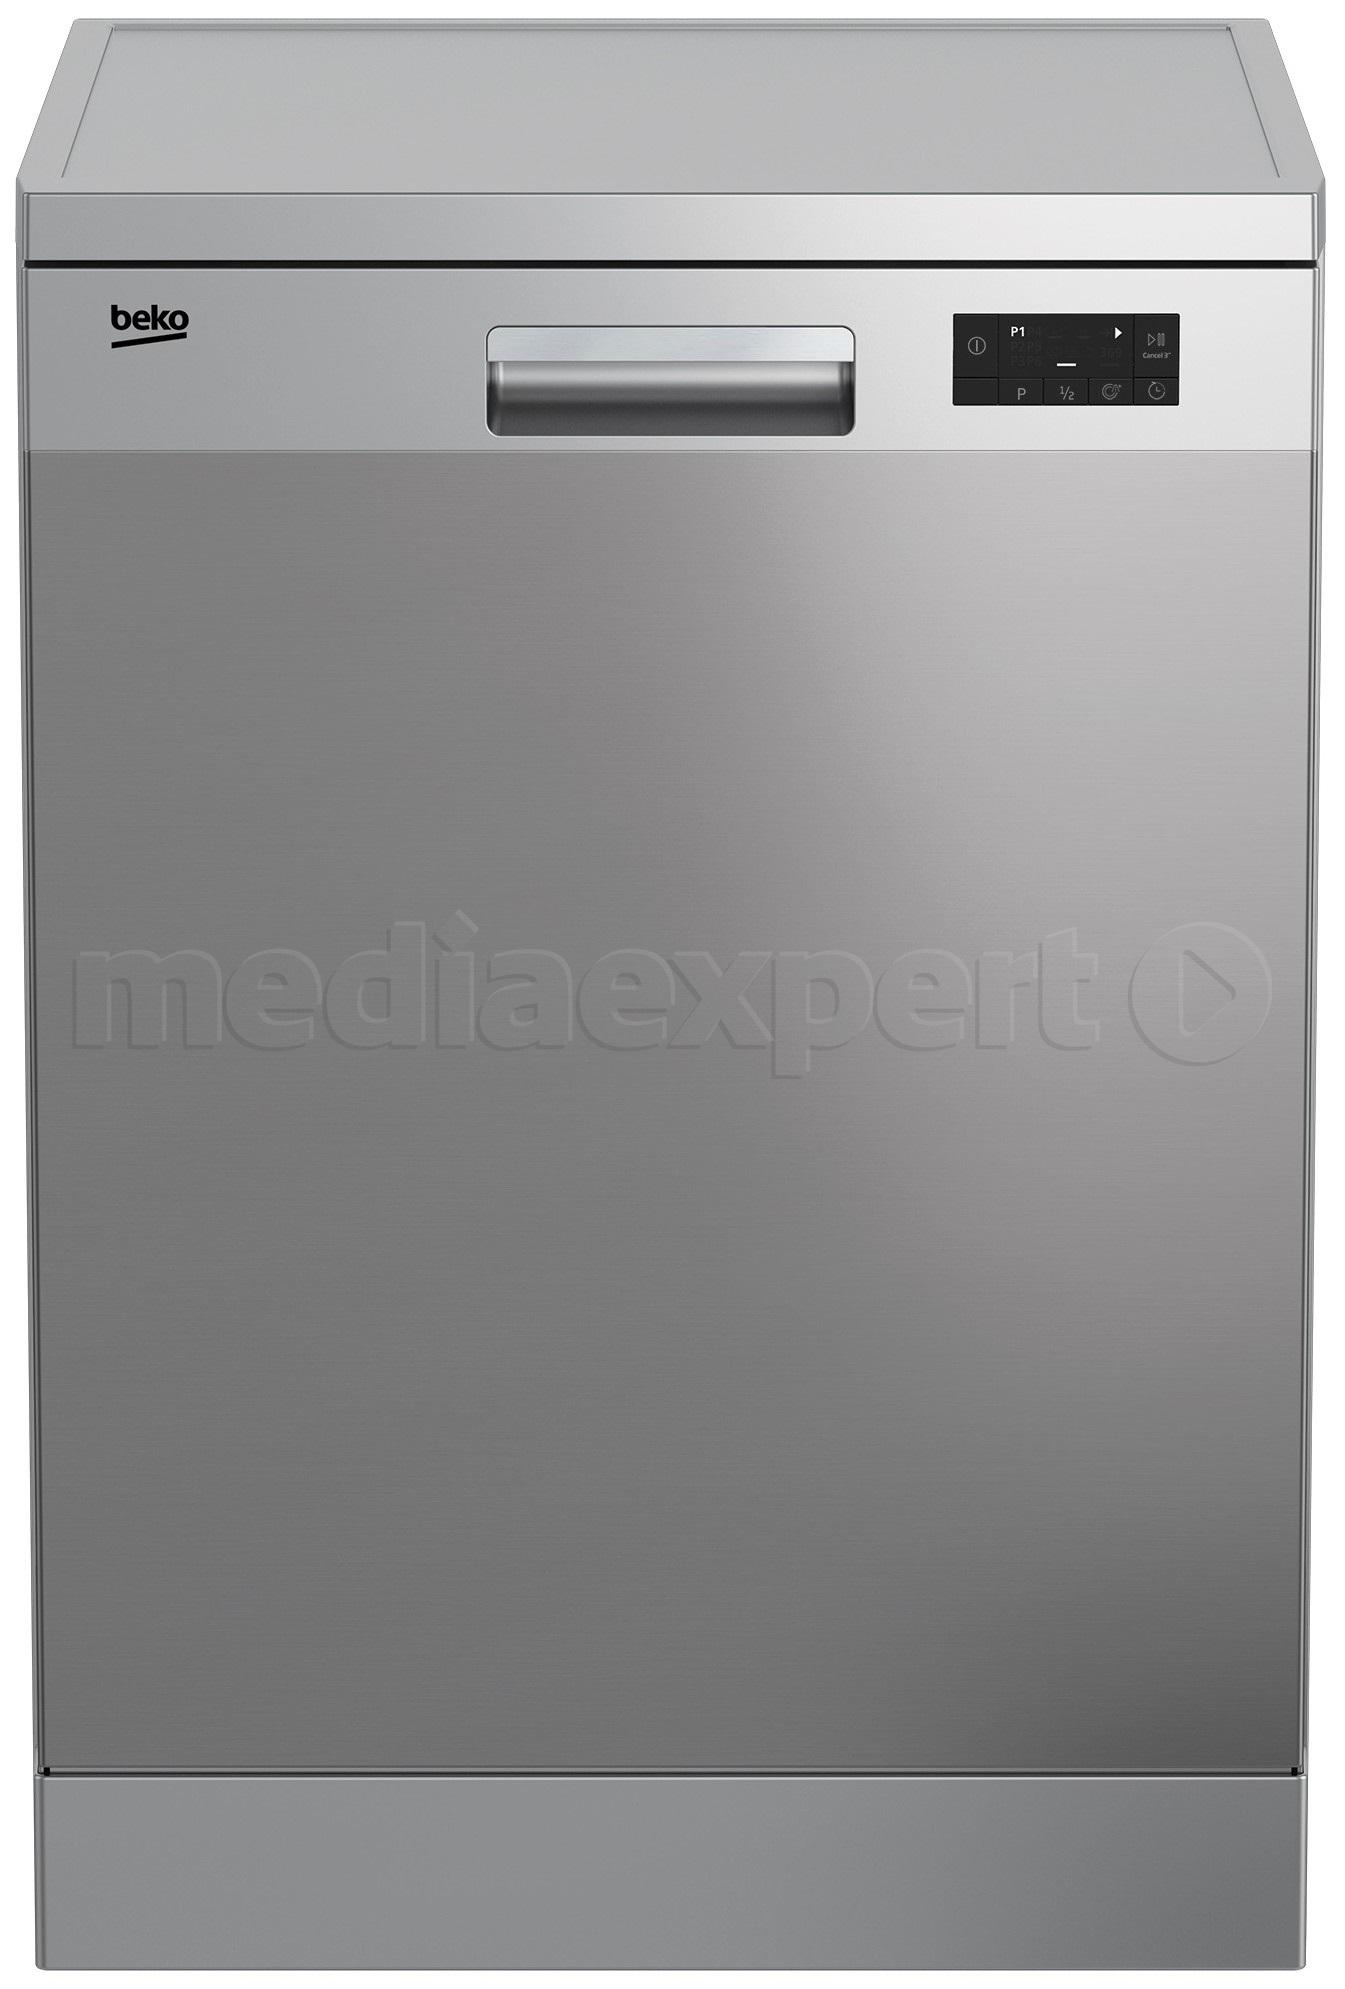 BEKO DFN16210X